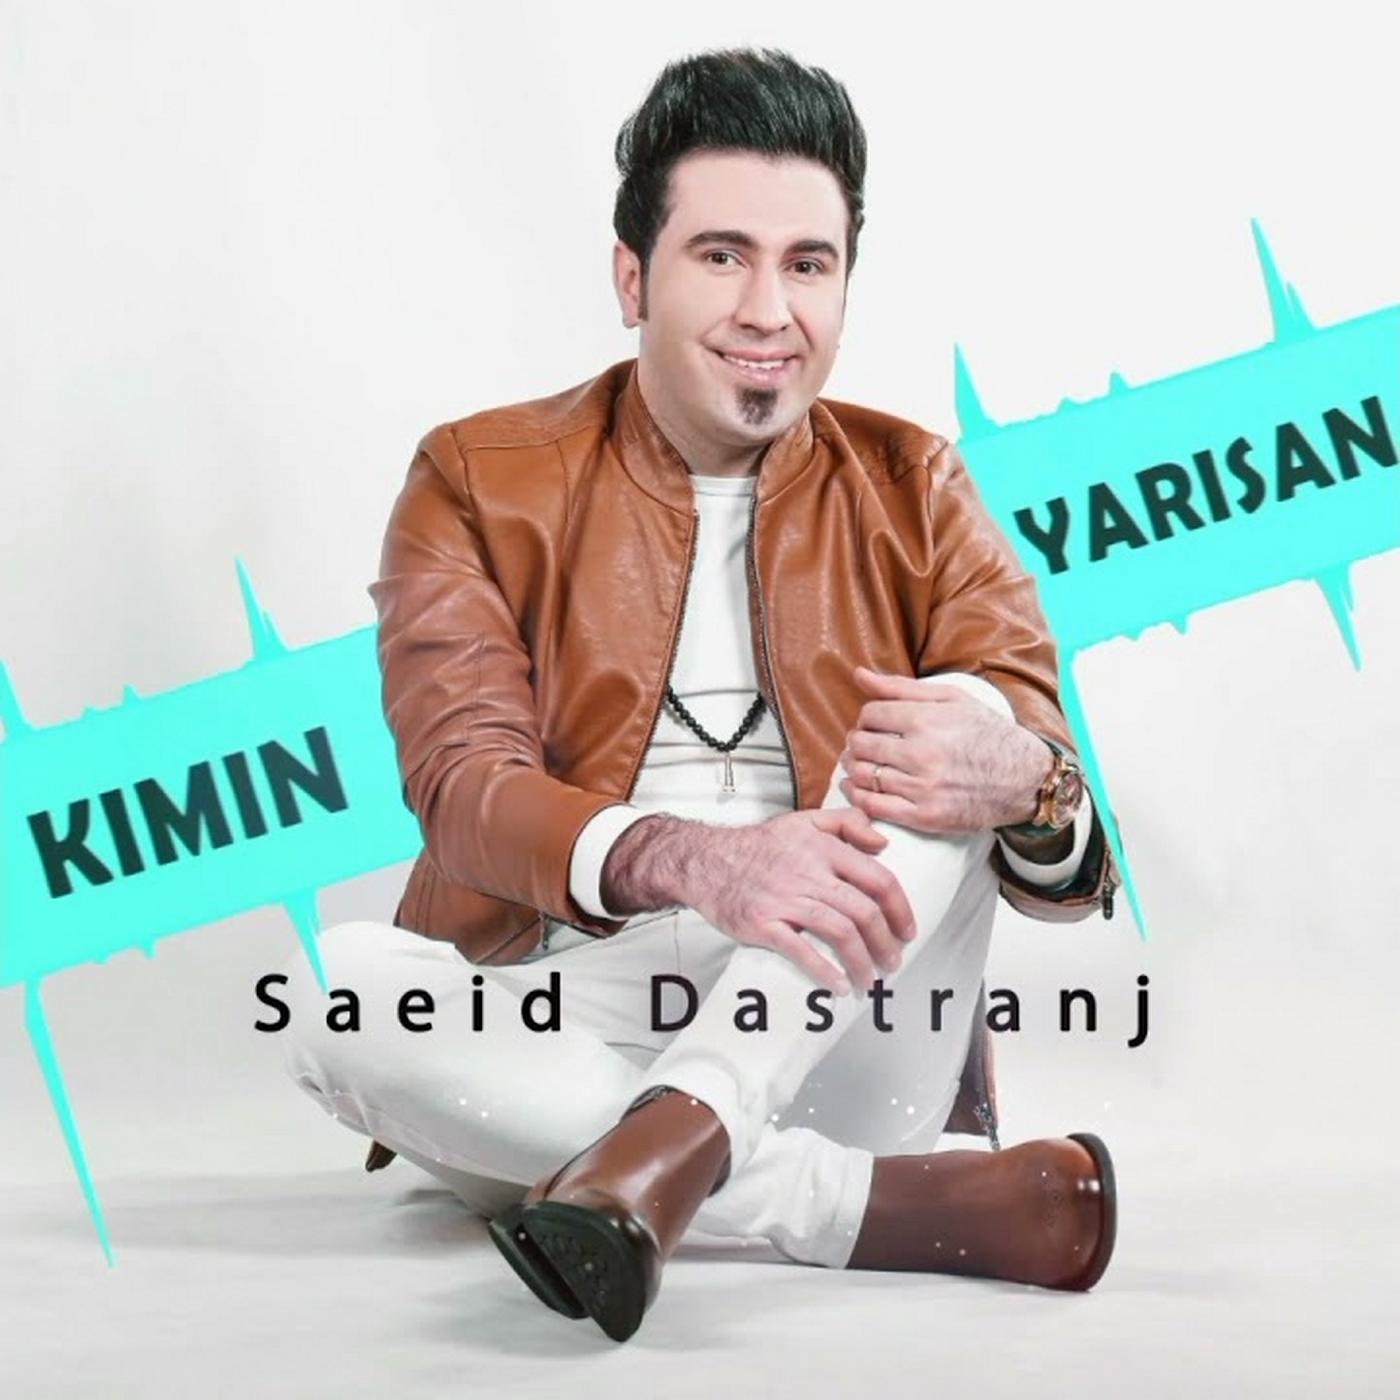 https://s16.picofile.com/file/8428732200/19Saeid_Dastranj_Kimin_Yarisan.jpg